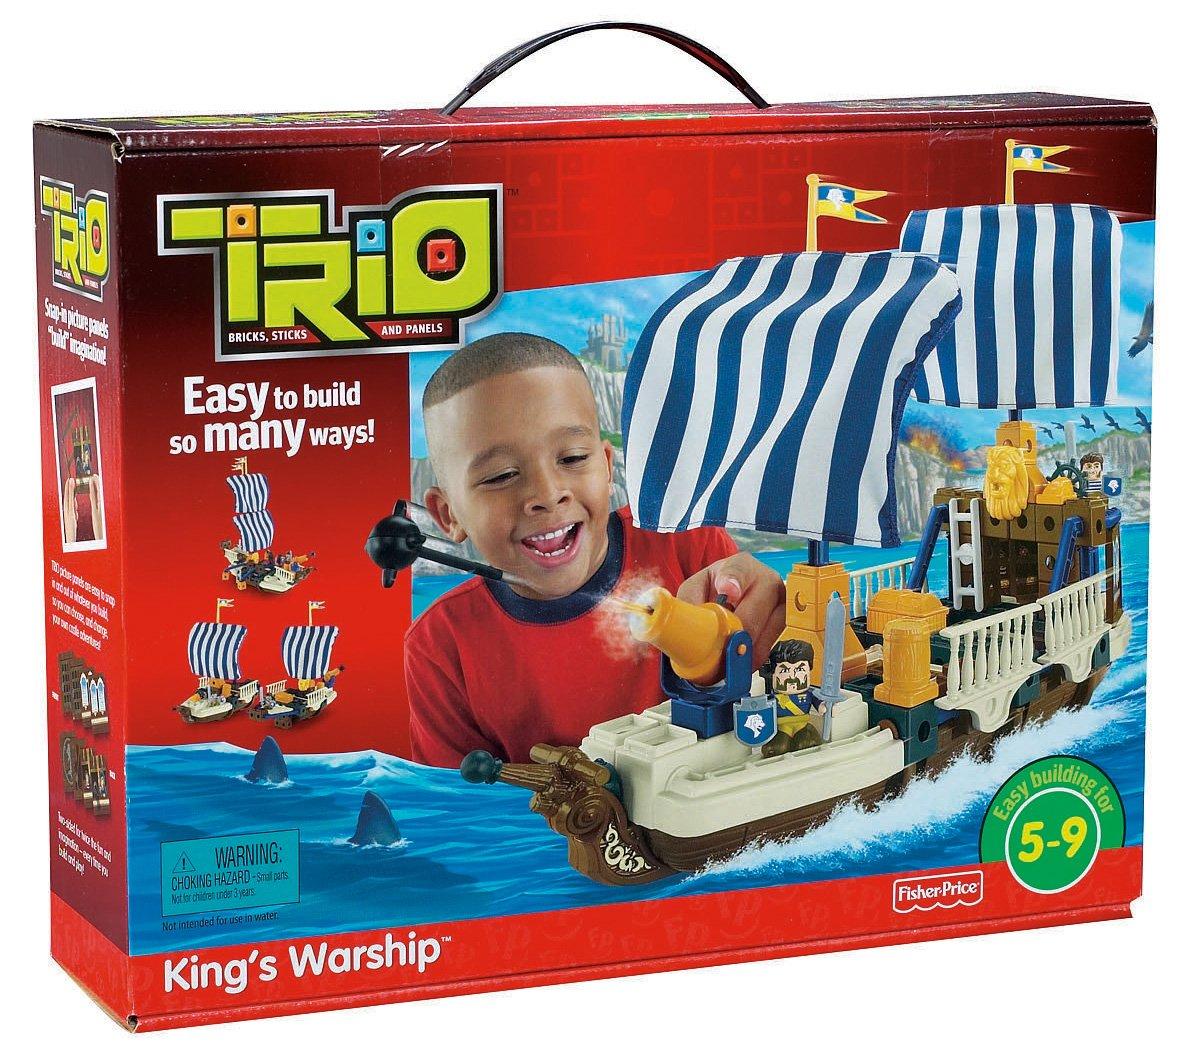 amazoncom fisherprice trio king's warship toys  games -